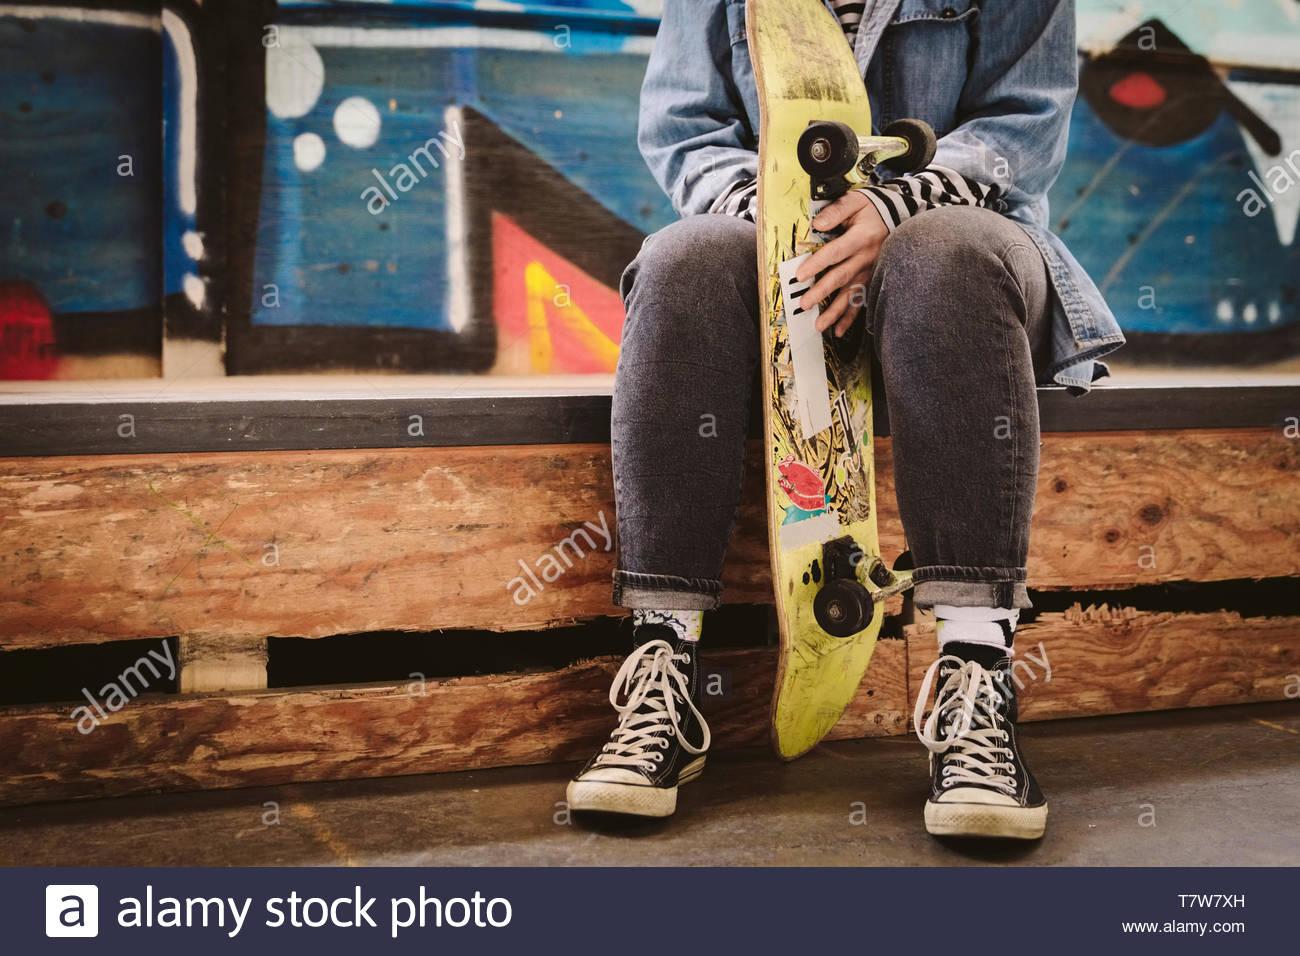 Mujer sosteniendo en monopatín skate park interior Imagen De Stock